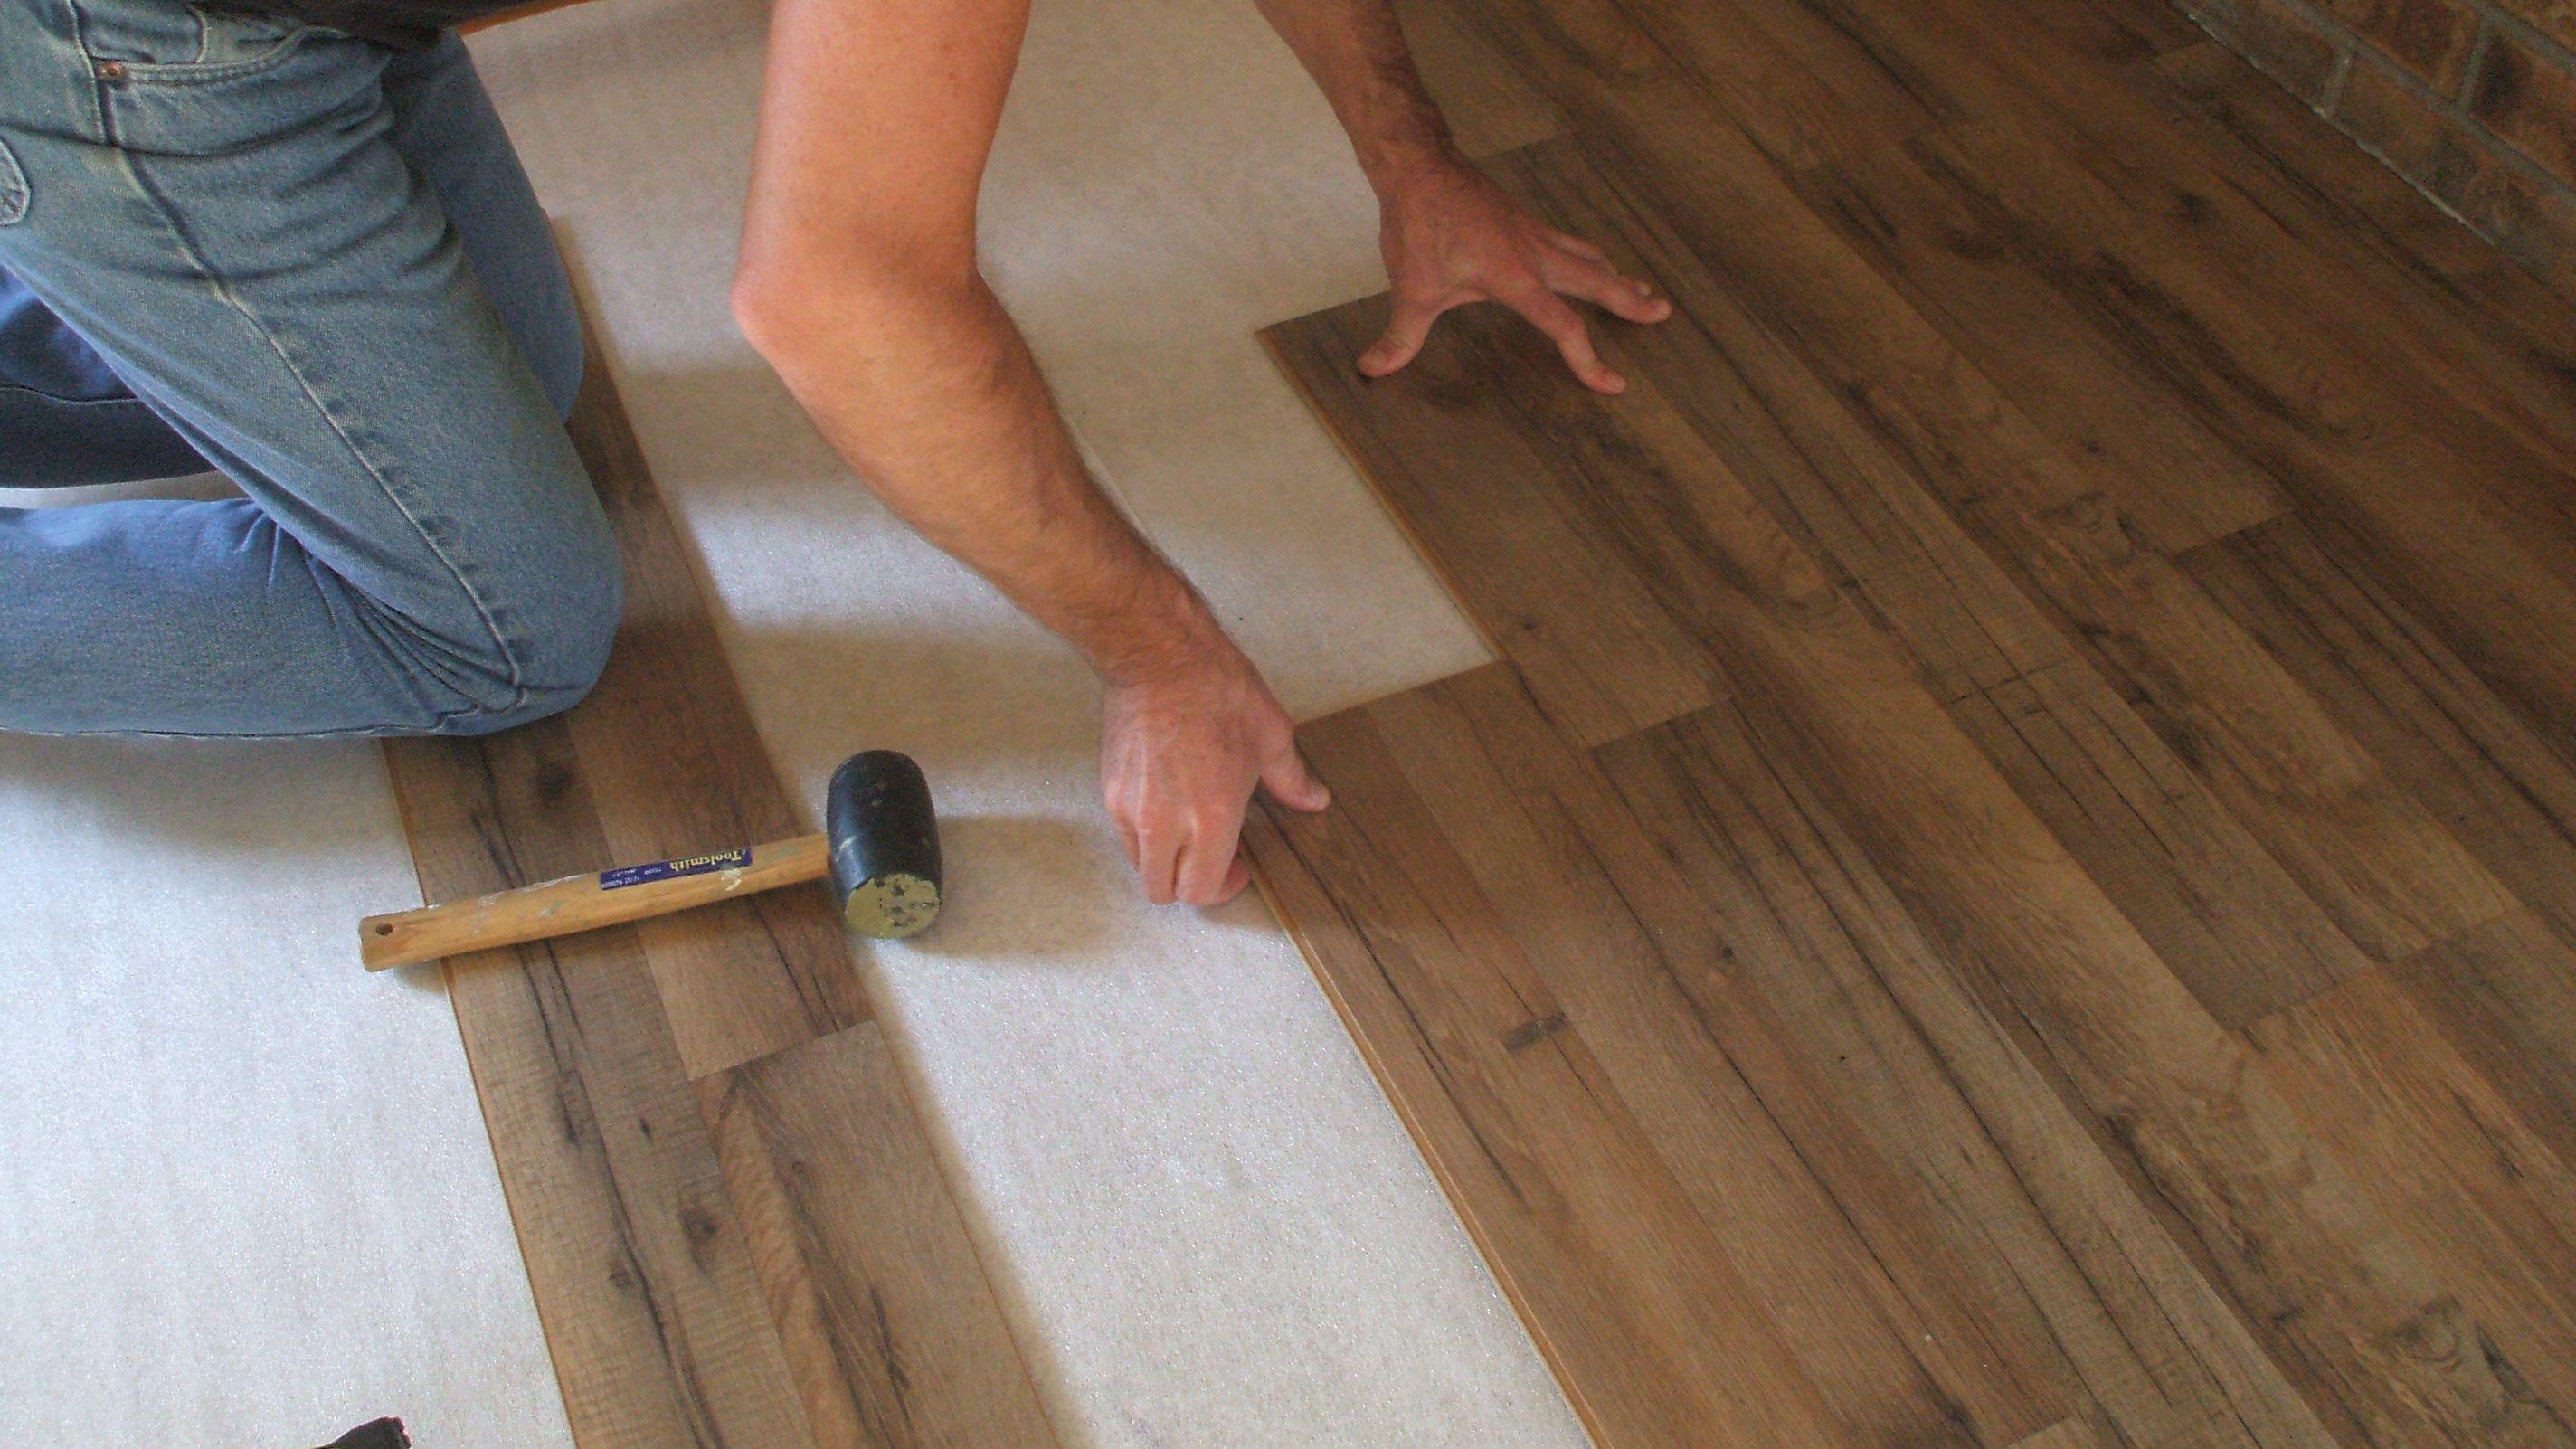 Wood Flooring Laminate Installation Kit Set Wooden Floor Fitting Tool Craft